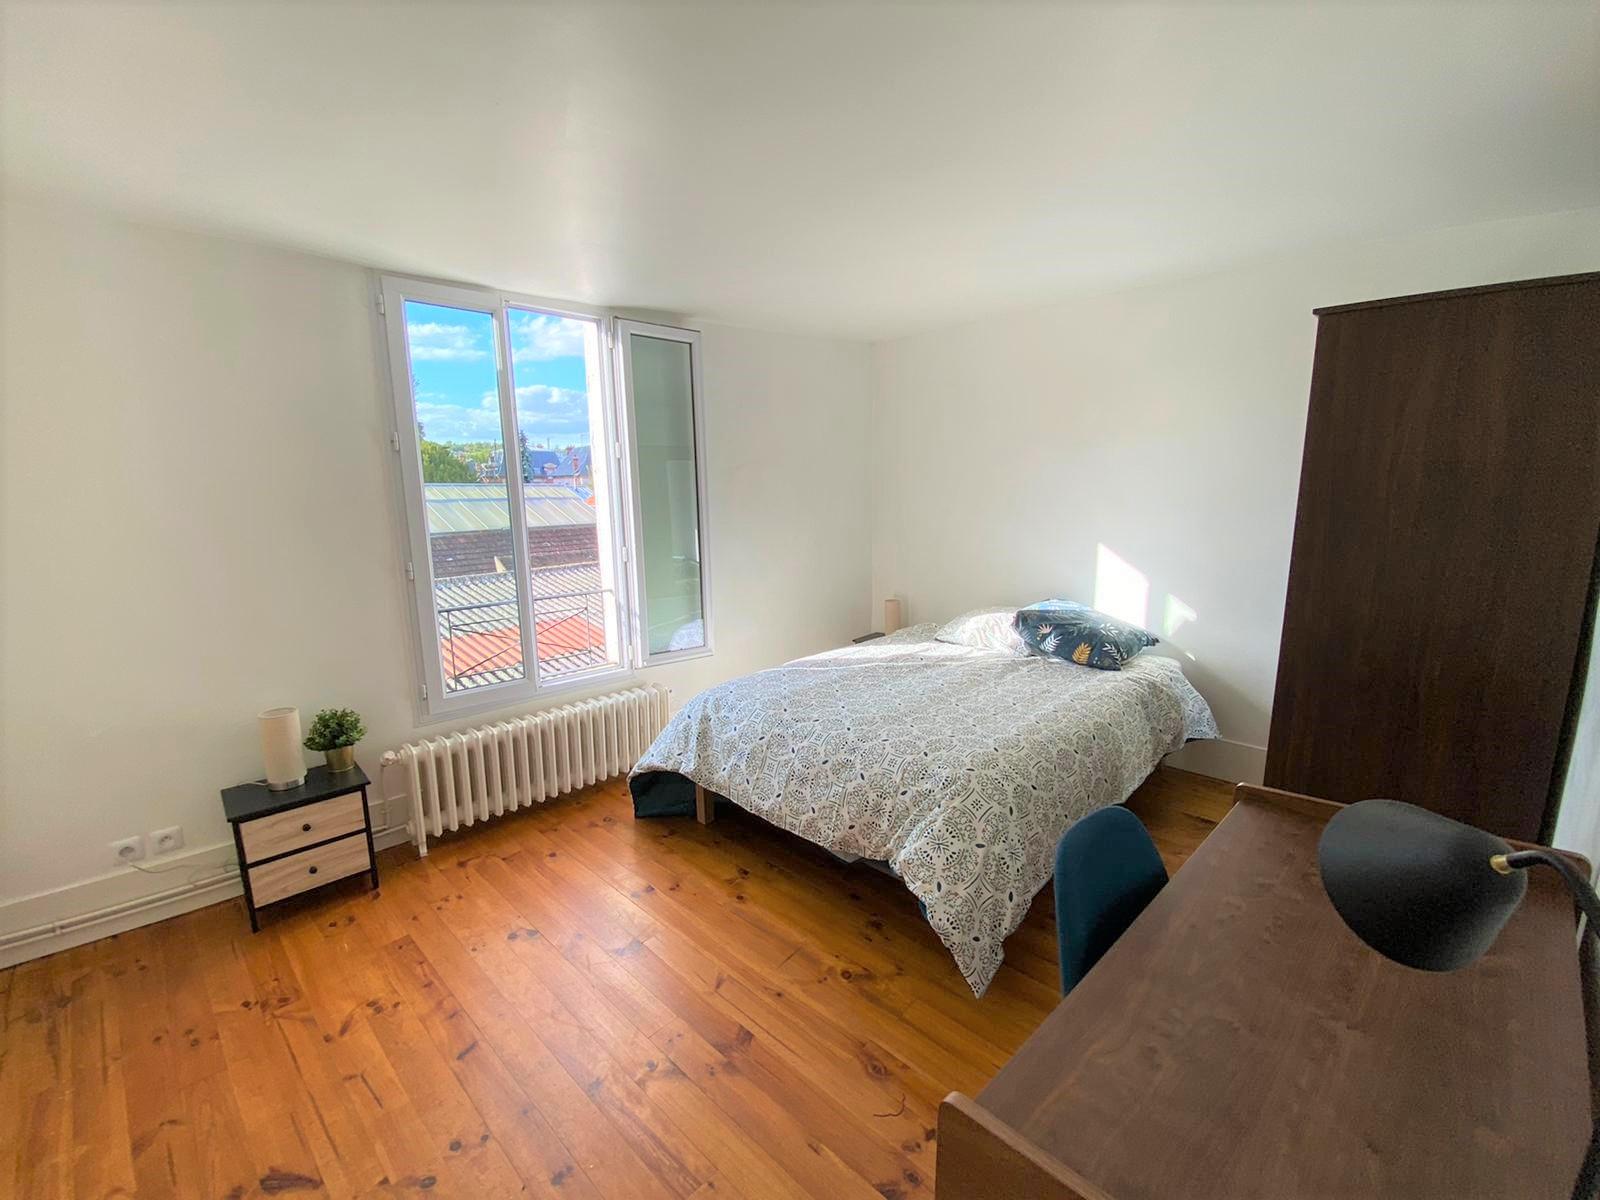 Bedroom 1 Insead MBA rental